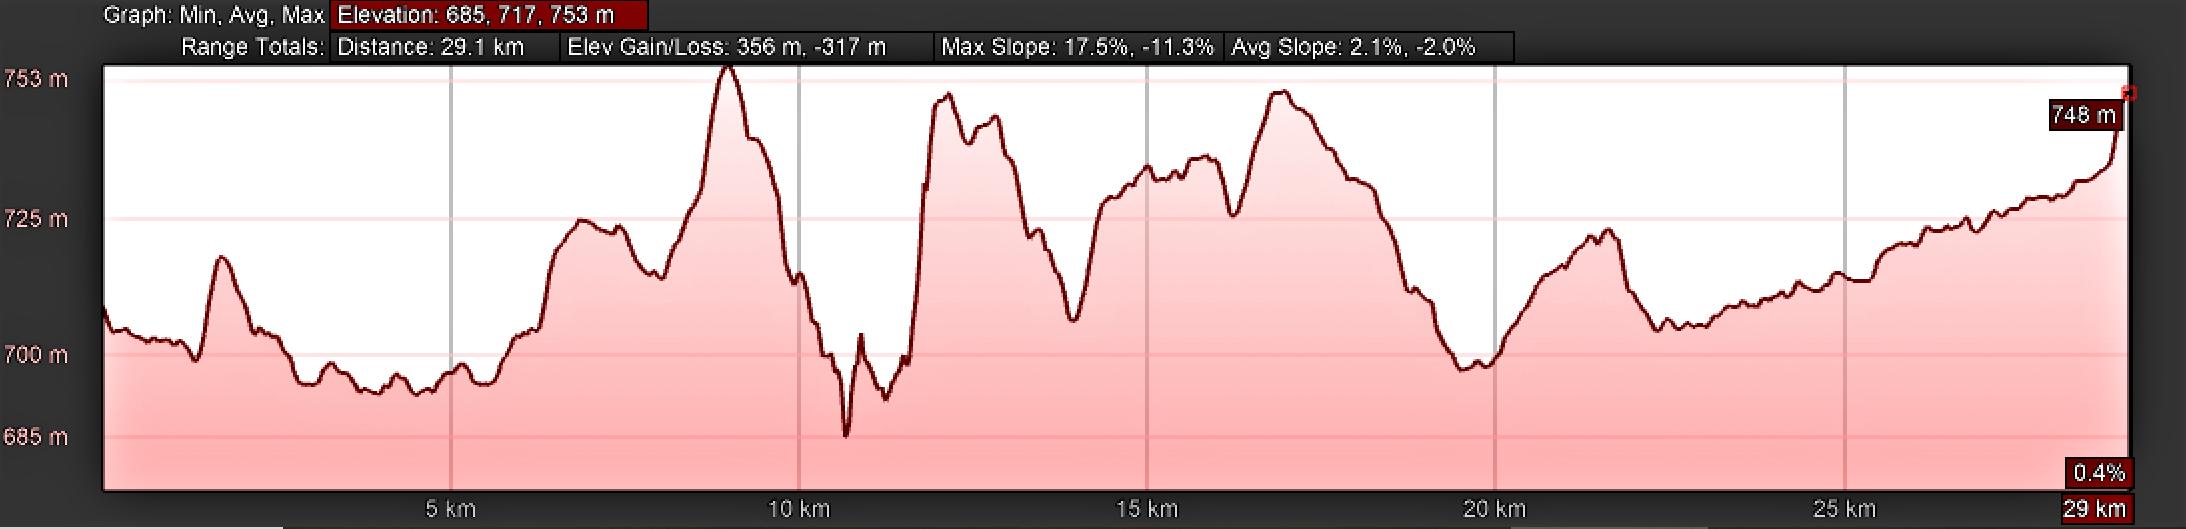 Elevation Profile, Camino Sanabrés from Granja de Moreruela to the Moreruela Abbey and to Tábara